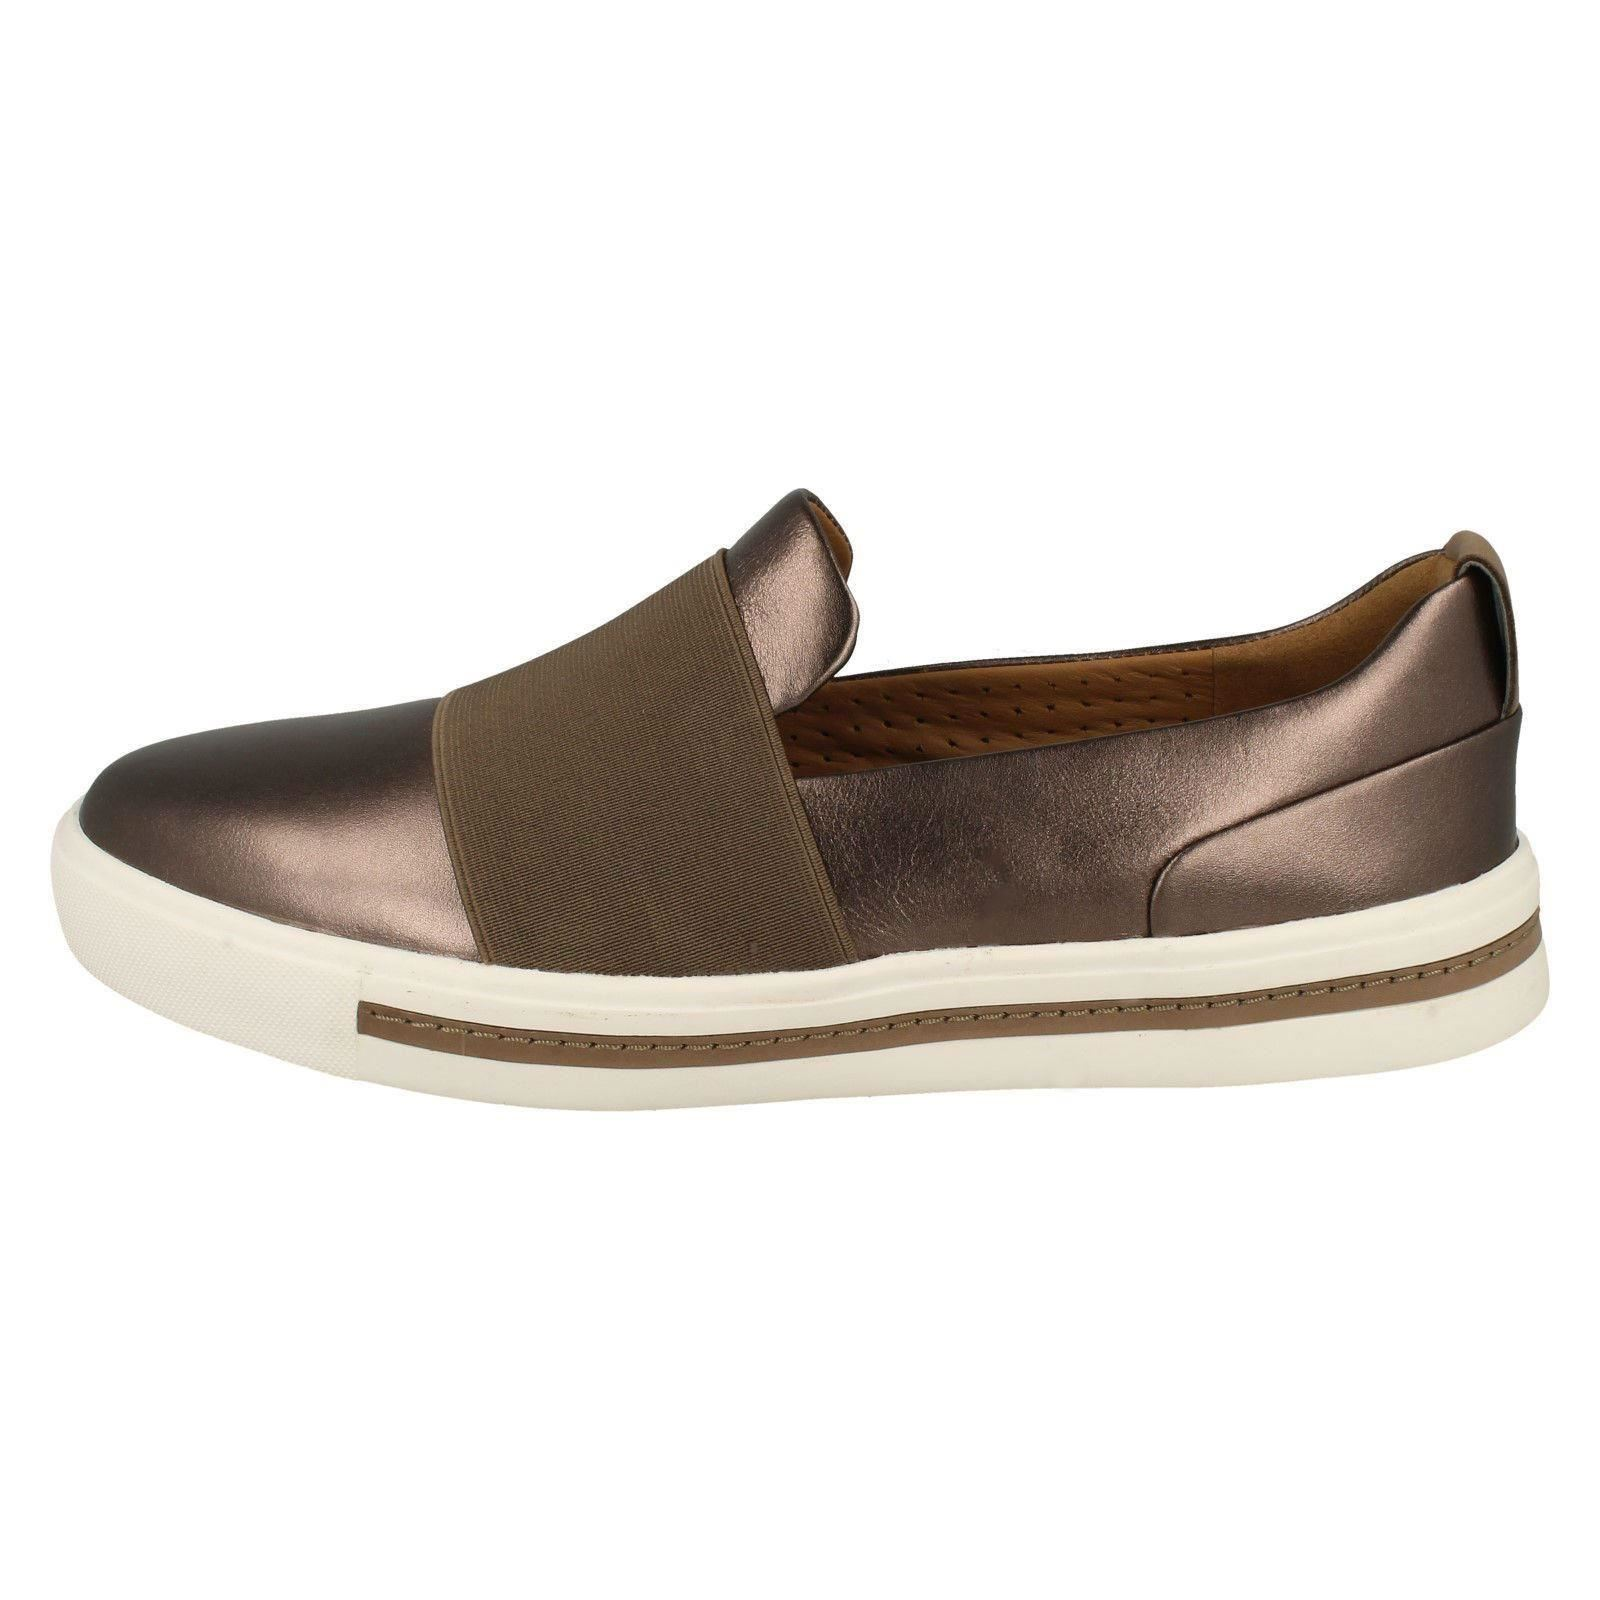 Femmes Clarks Unstructured Slip On Chaussures ONU Maui étape